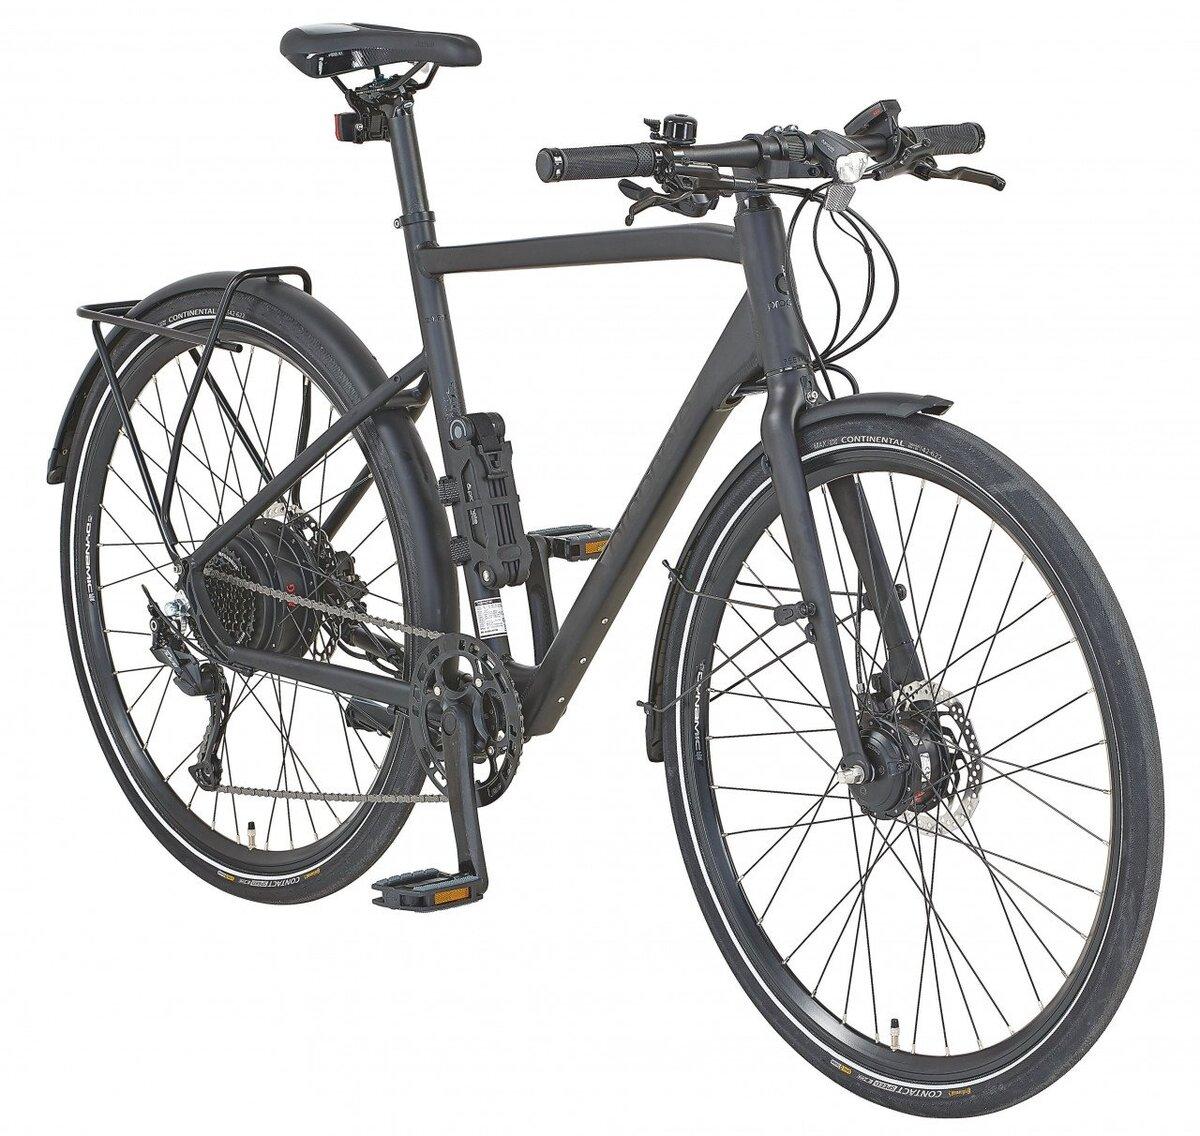 Bild 1 von Prophete Herren City E-Bike Urbanicer 28''  21.EMU.10